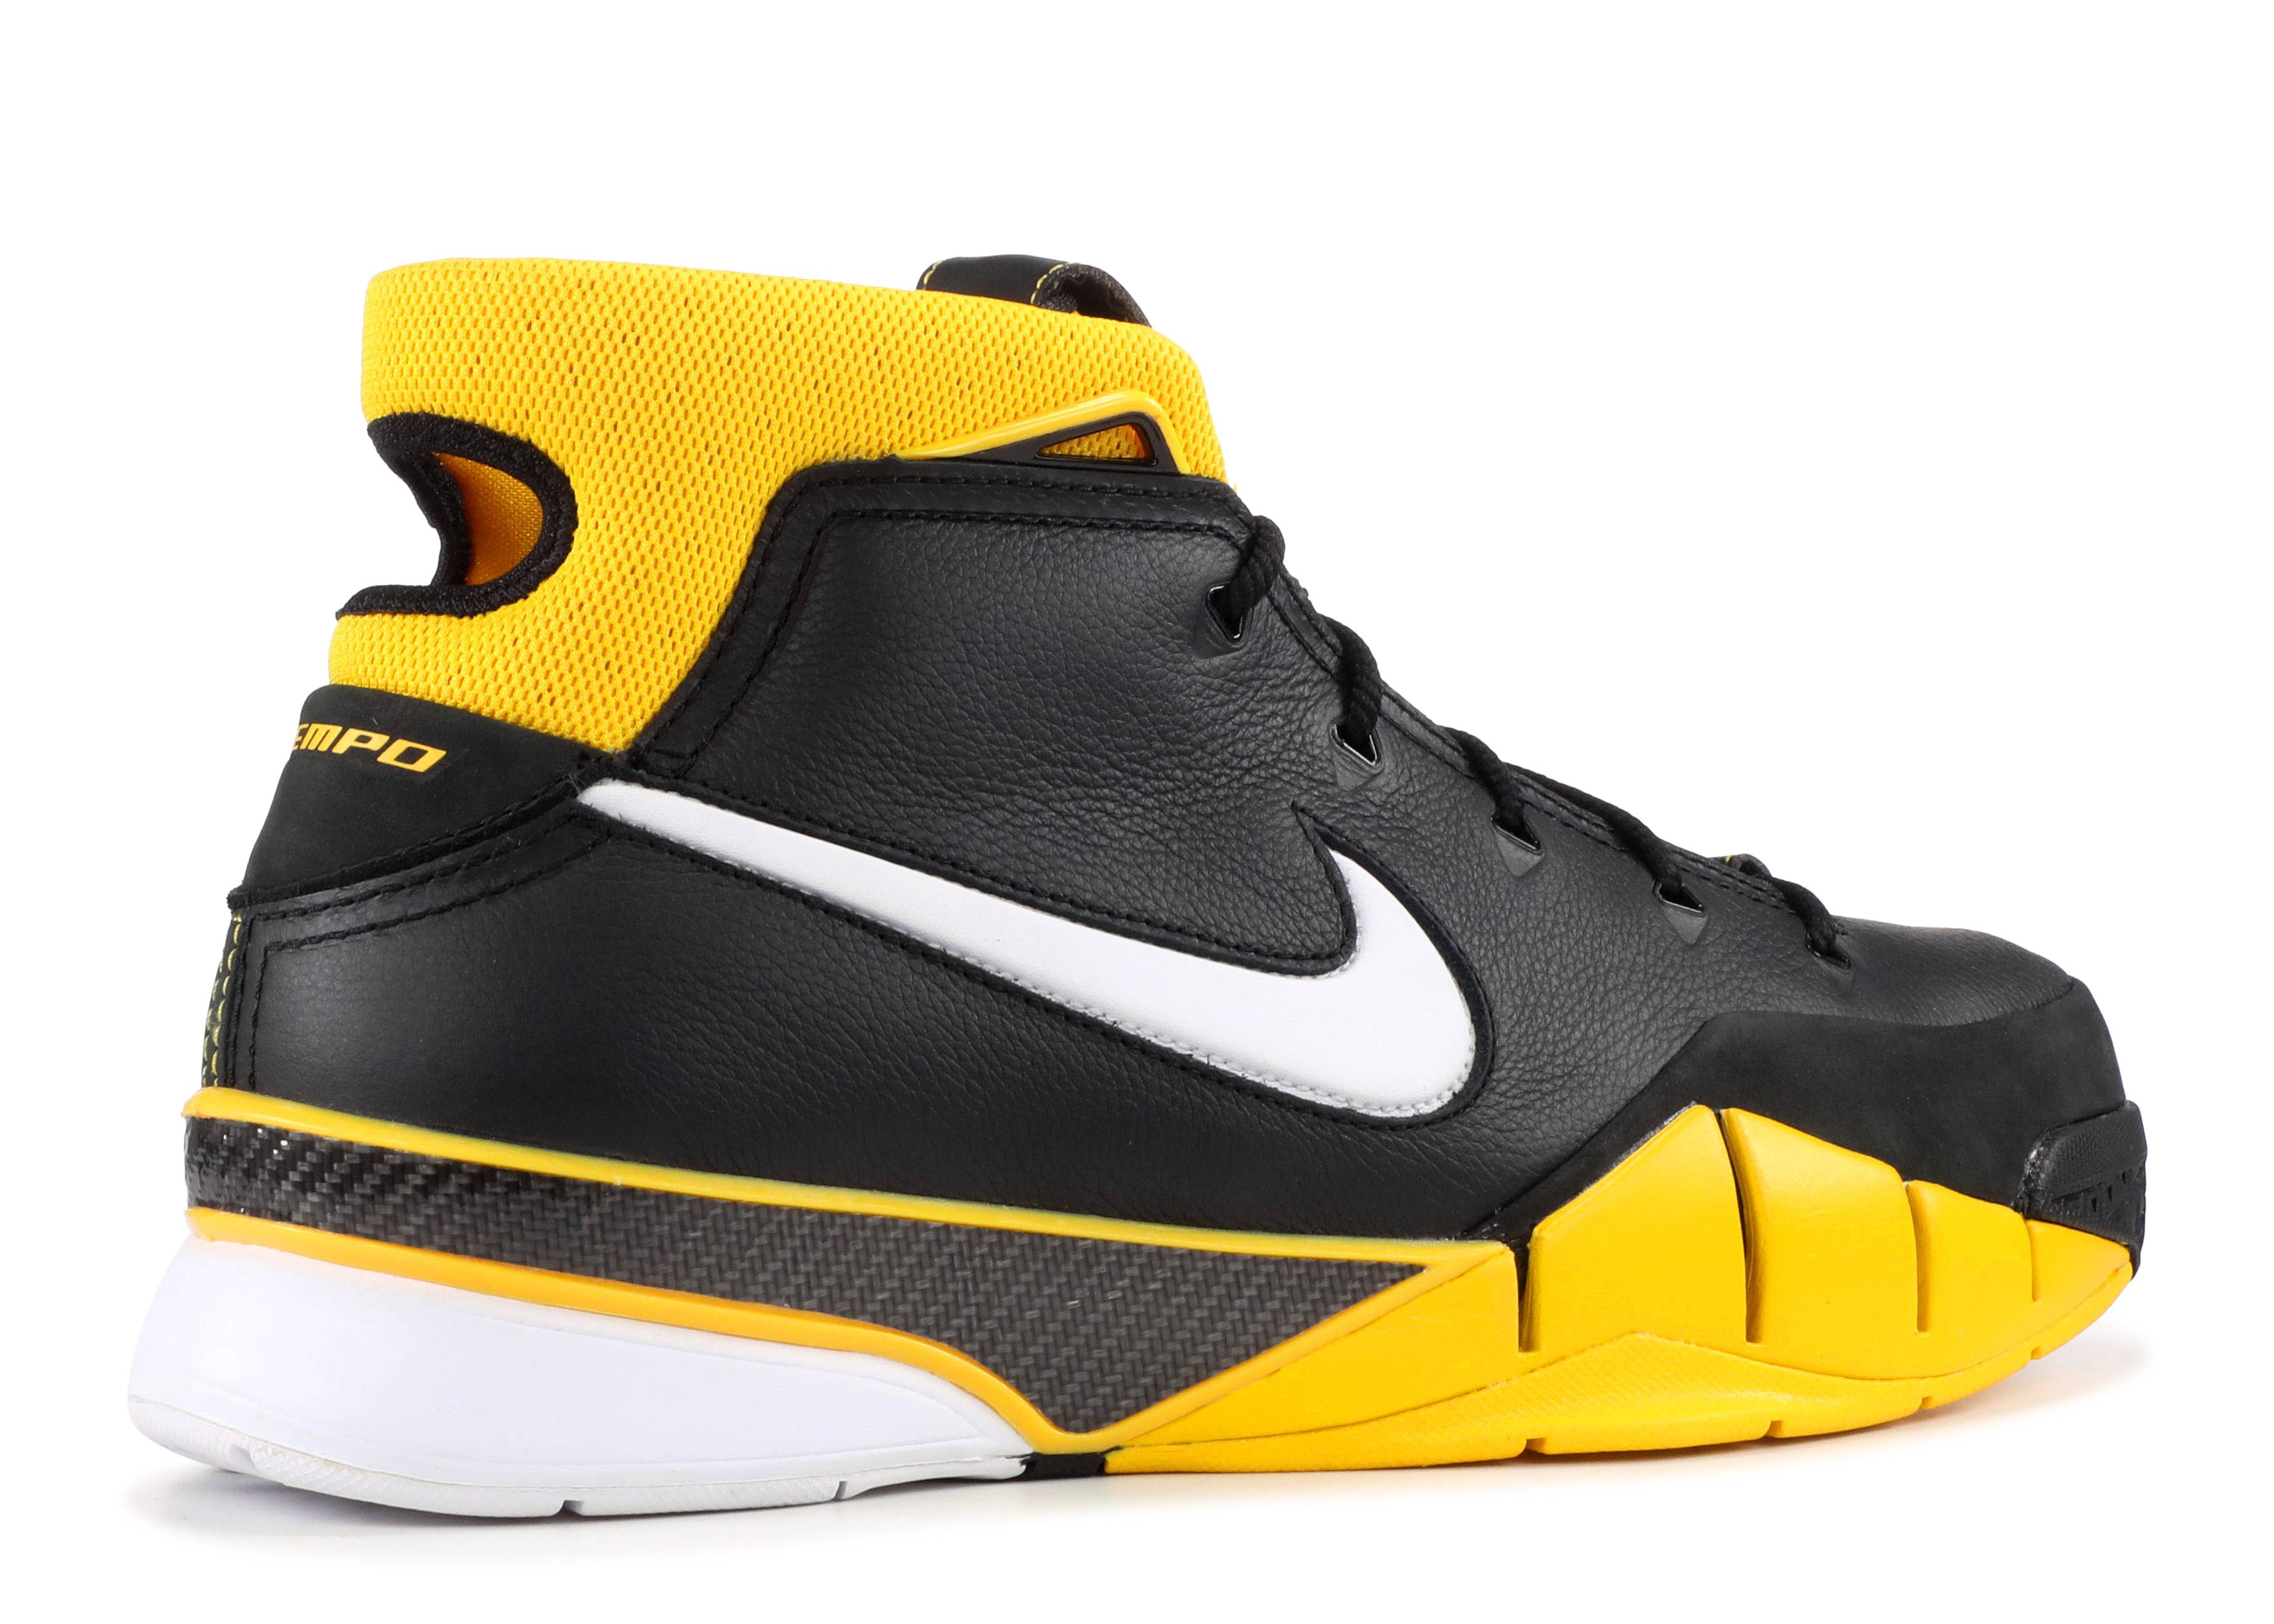 ba26197e38b Kobe 1 Protro - Nike - AQ2728 003 - black.white-varsity maize ...